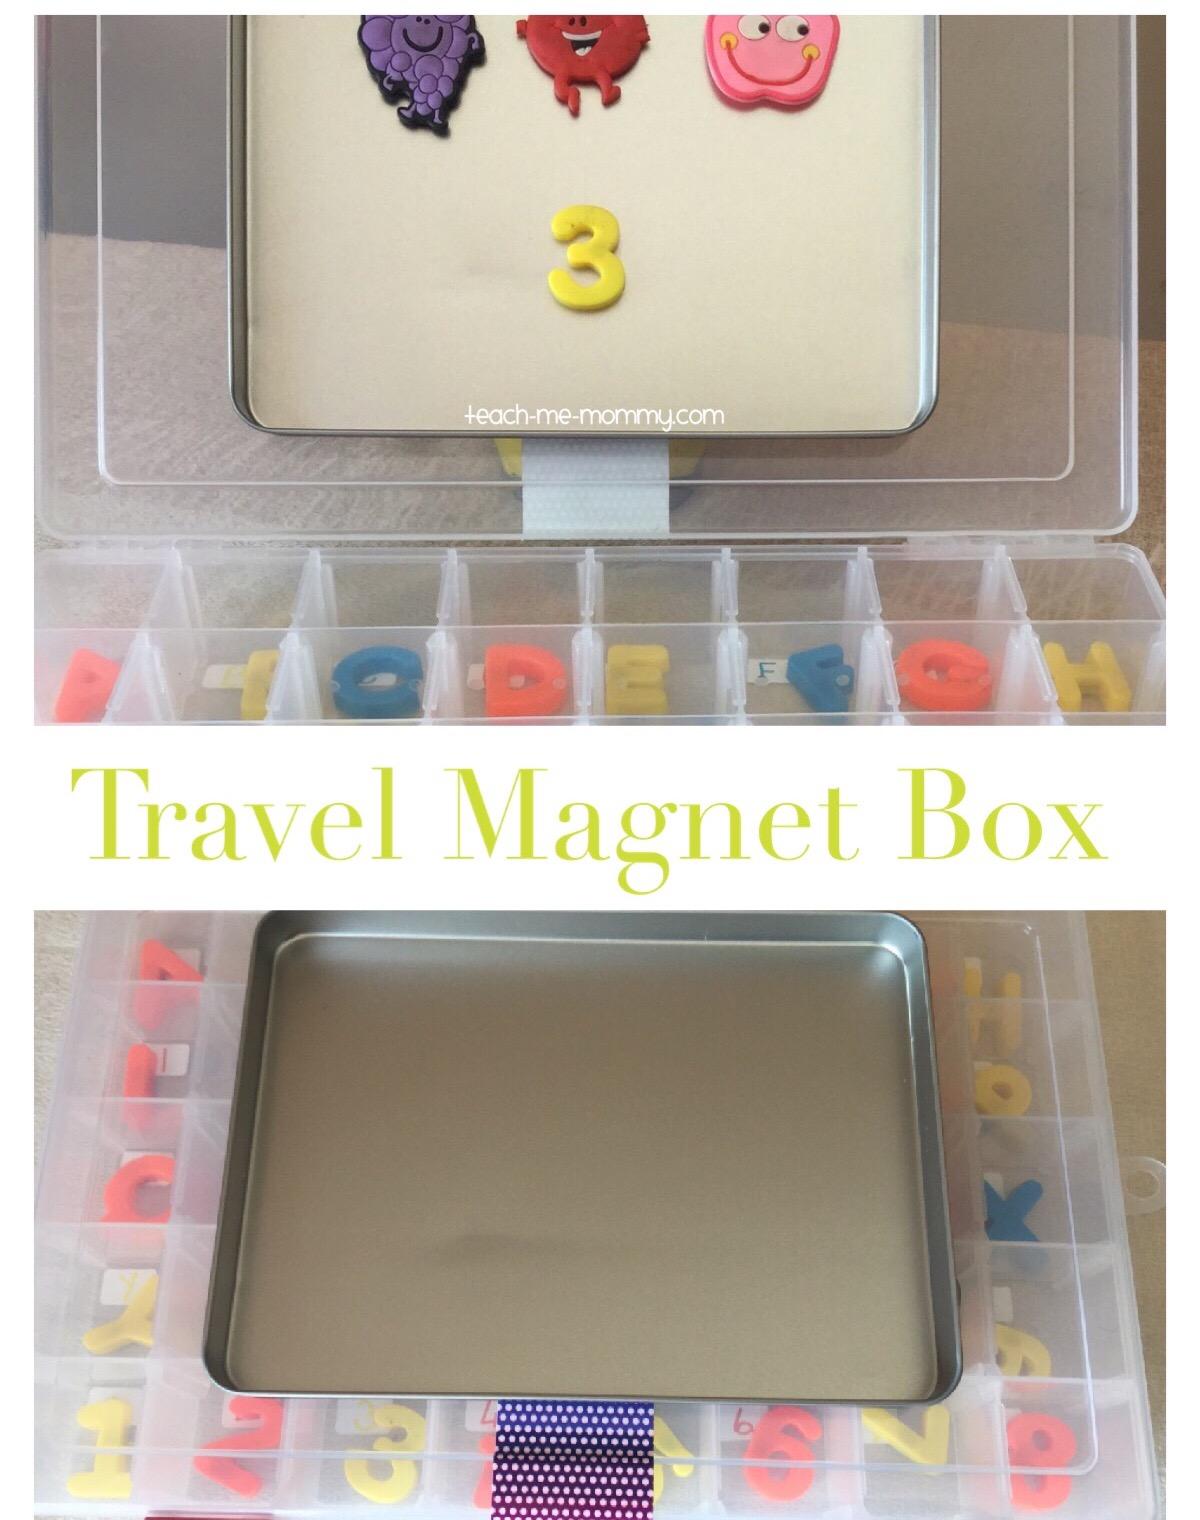 travel magnet box